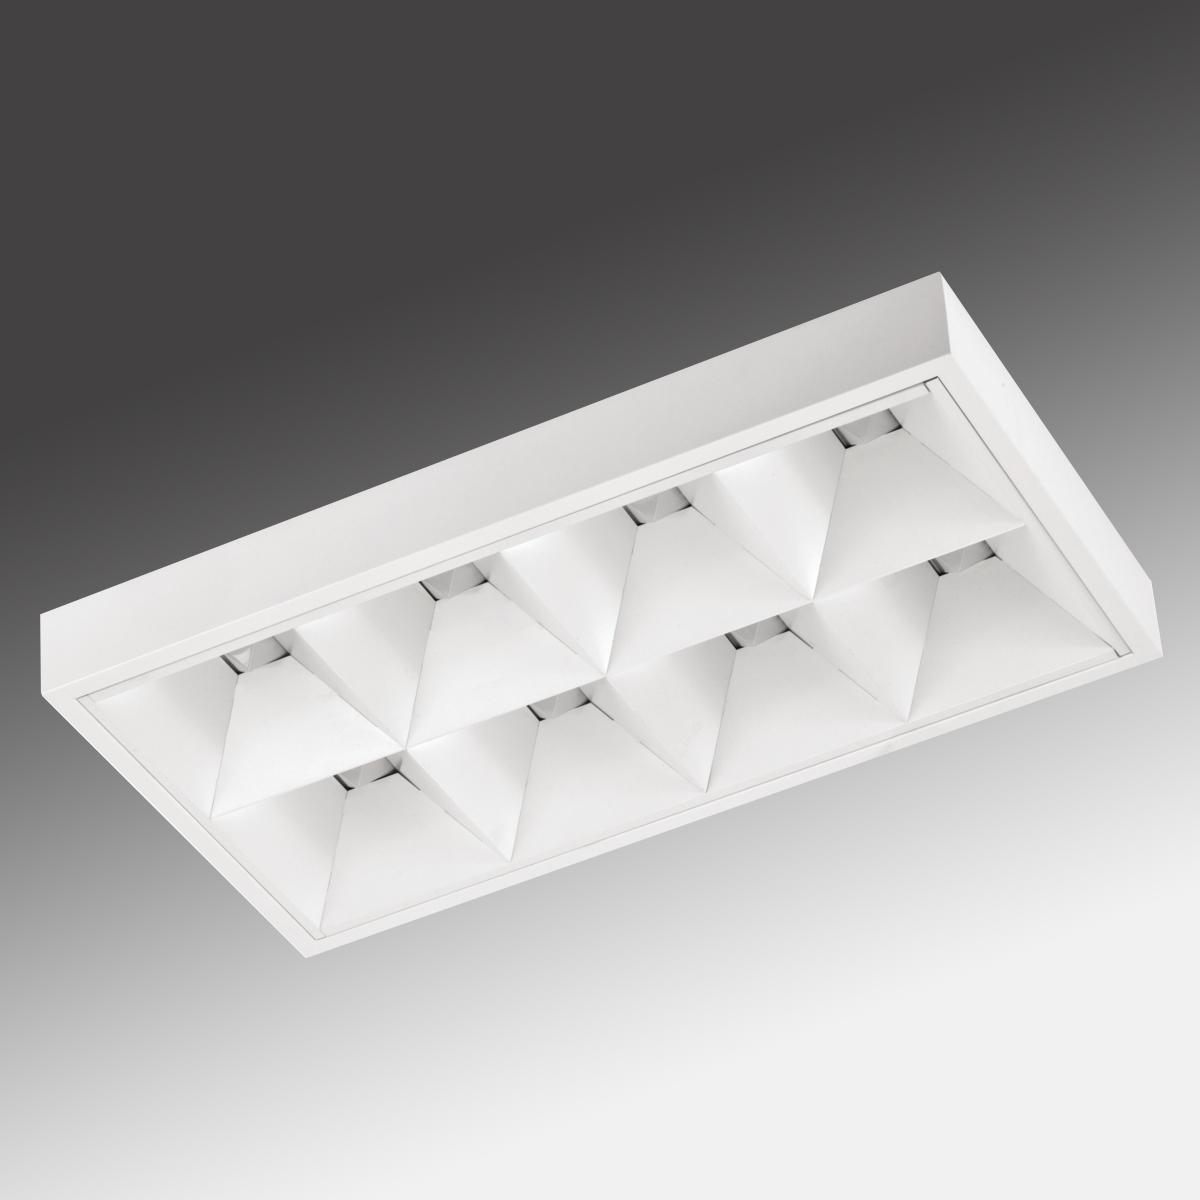 1 Stk SALENA LED 39W 3900lm/830 SLB EVG IP20 weiß LIG6100138